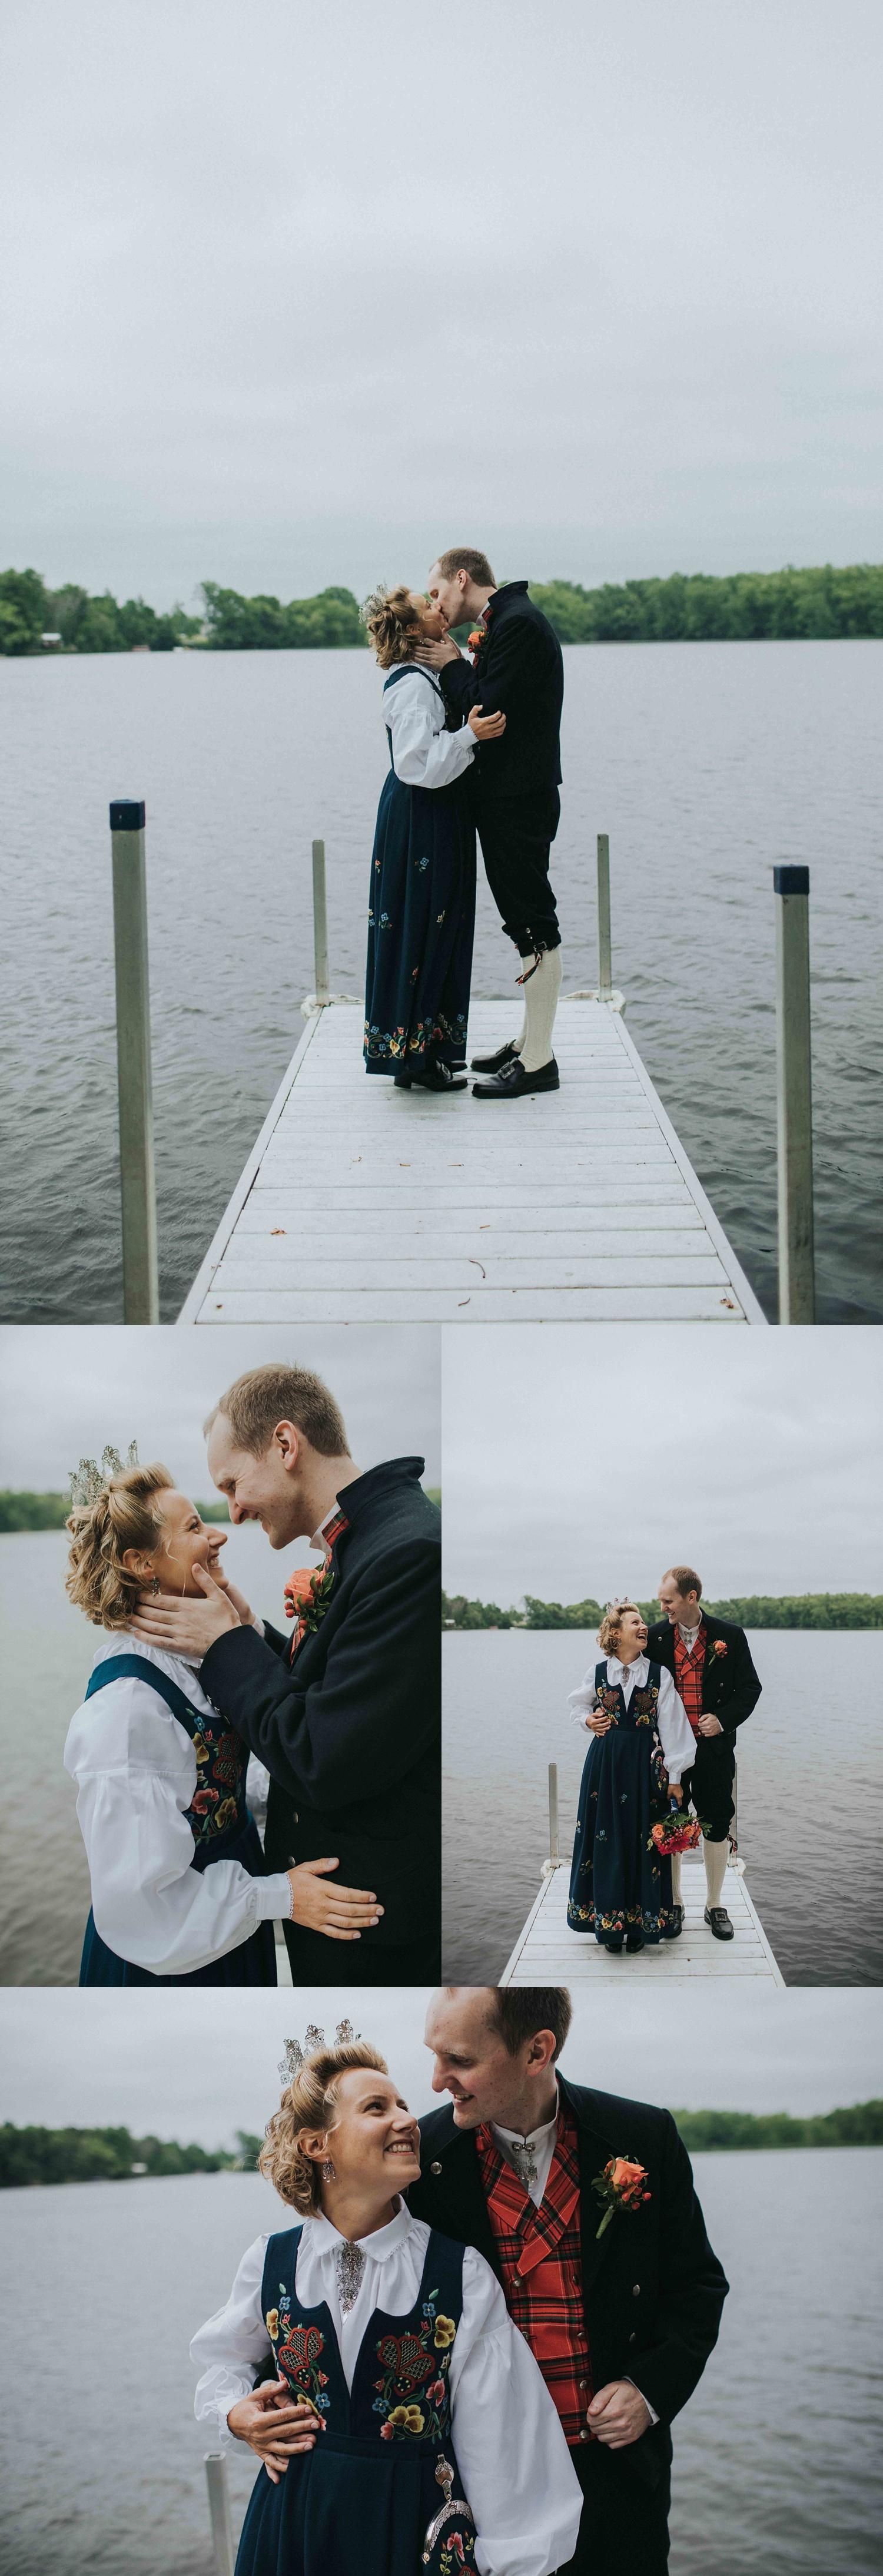 Norwegian Wedding Stevens Point Wisconsin Wedding Photographer Chloe Ann Photography_0007.jpg